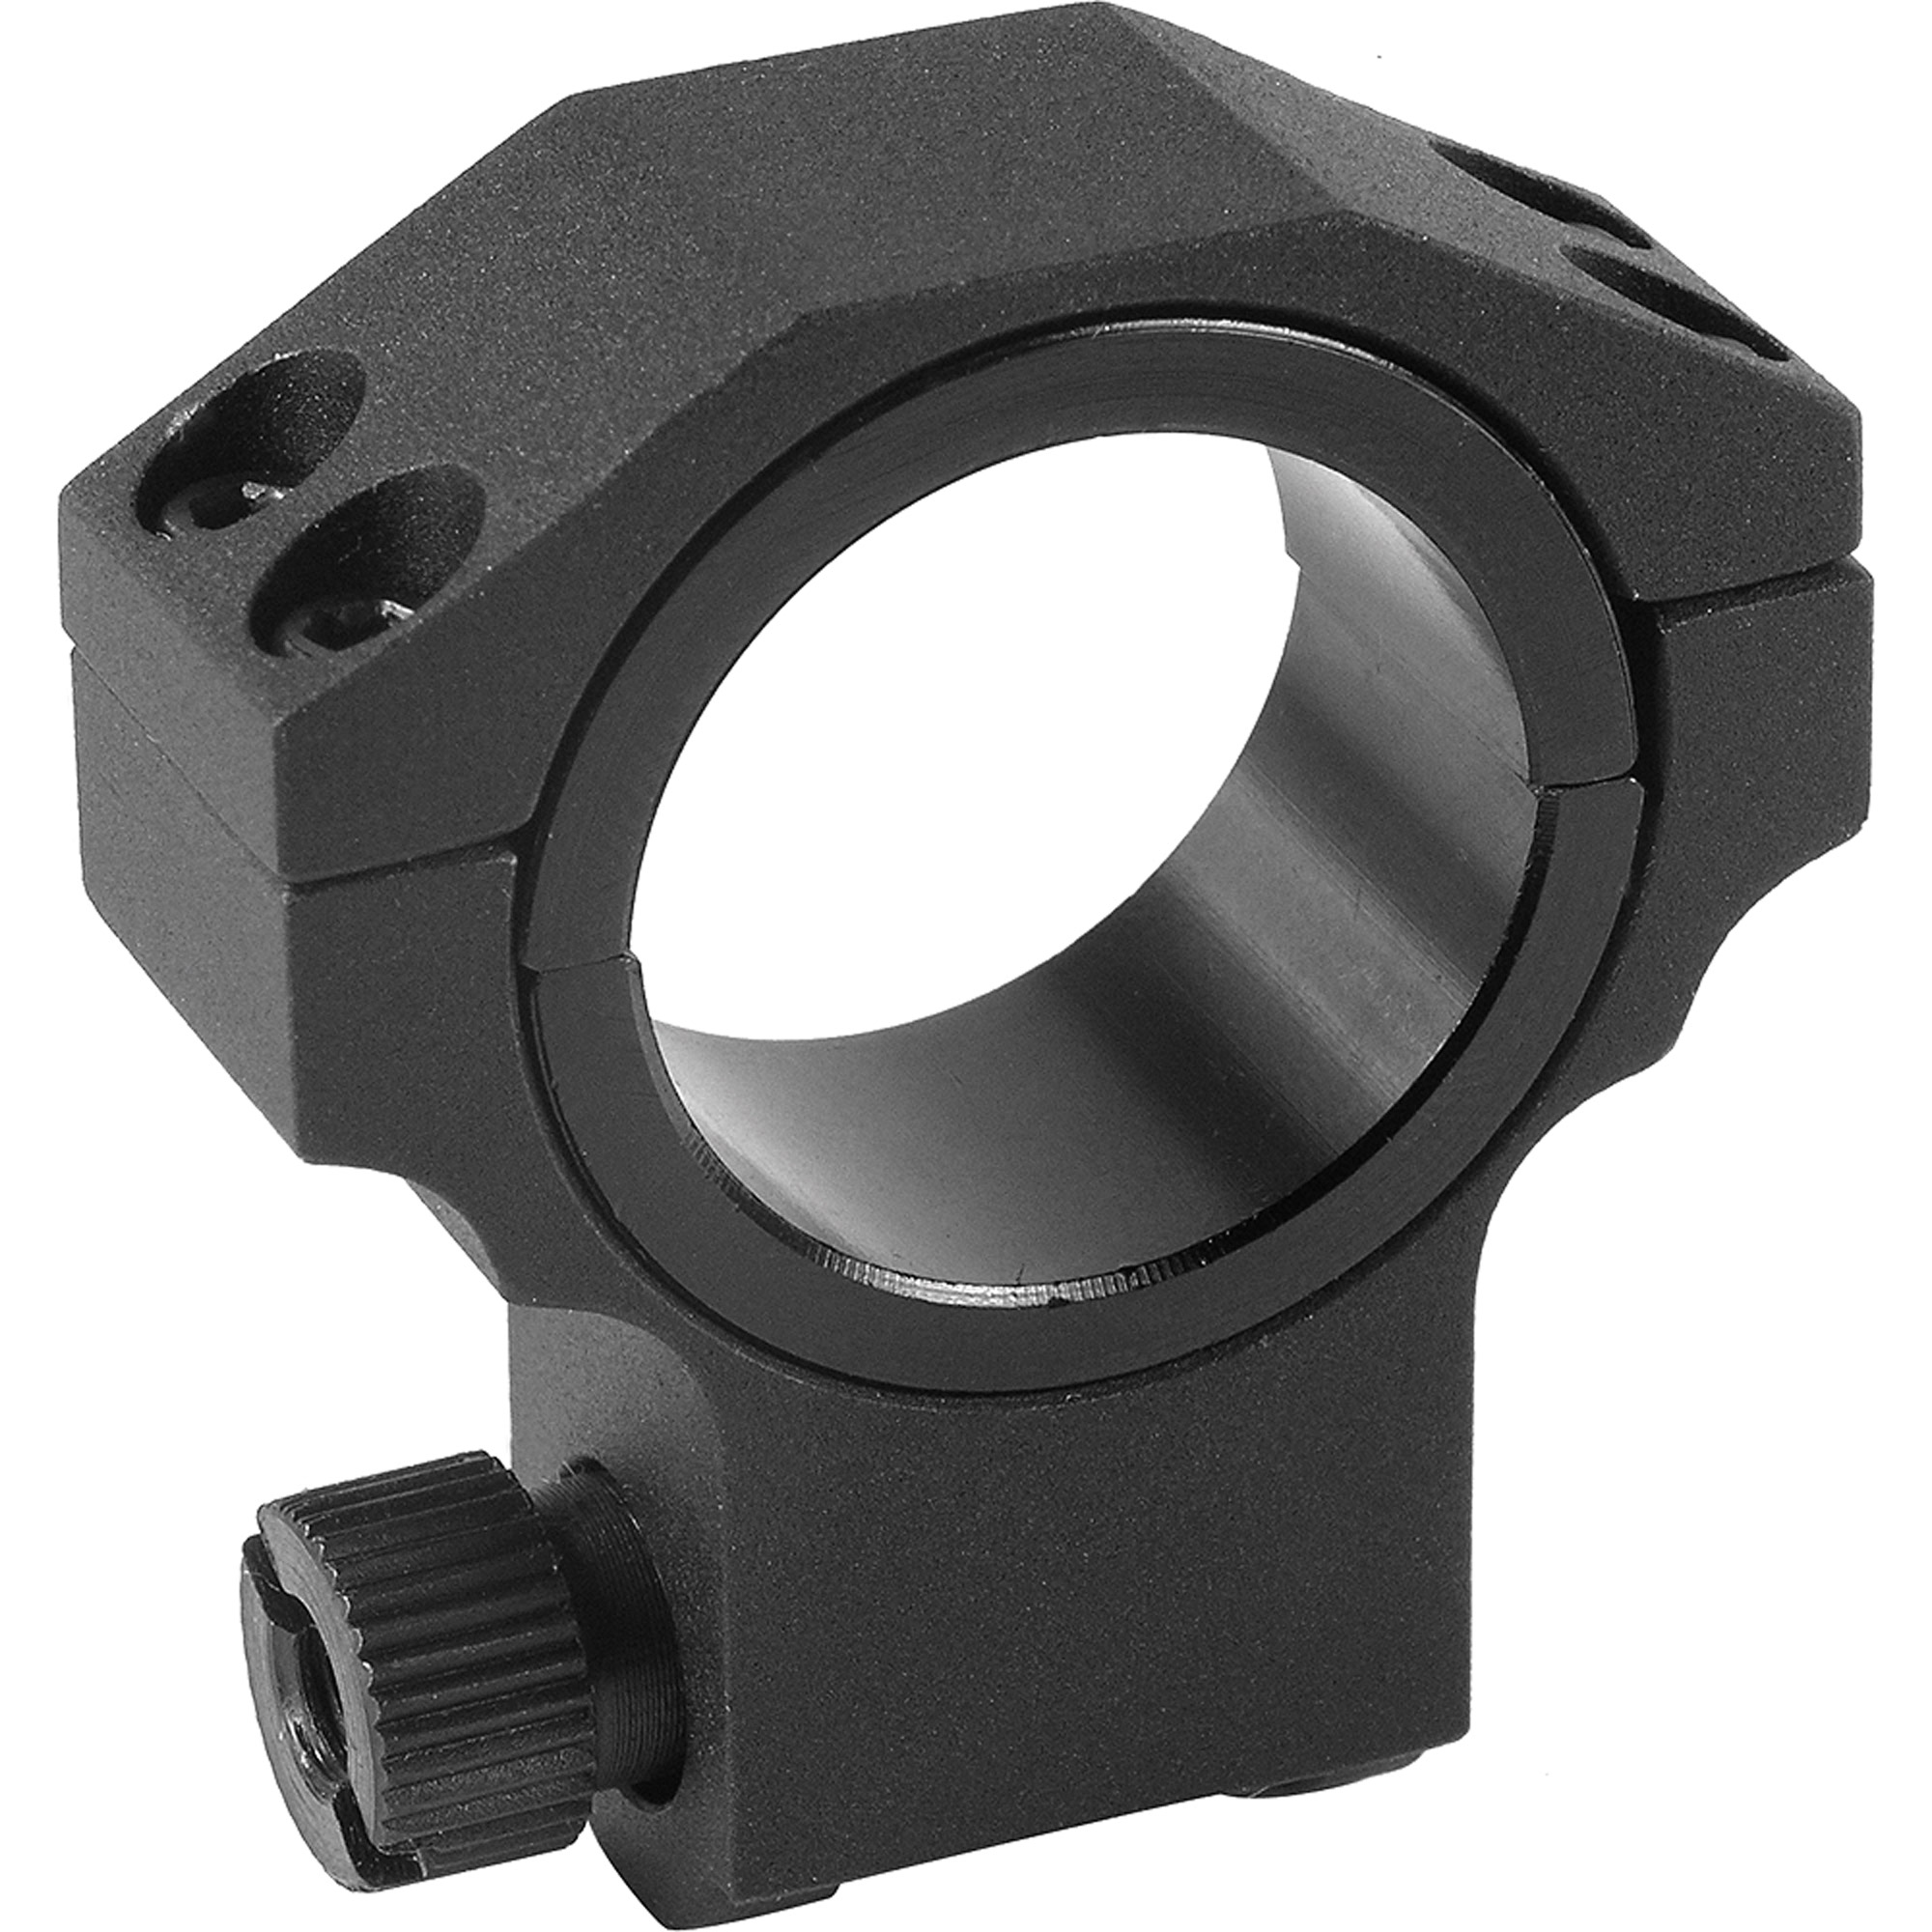 "Barska Optics 30mm High Ruger Style Scope Ring with 1"" Insert"